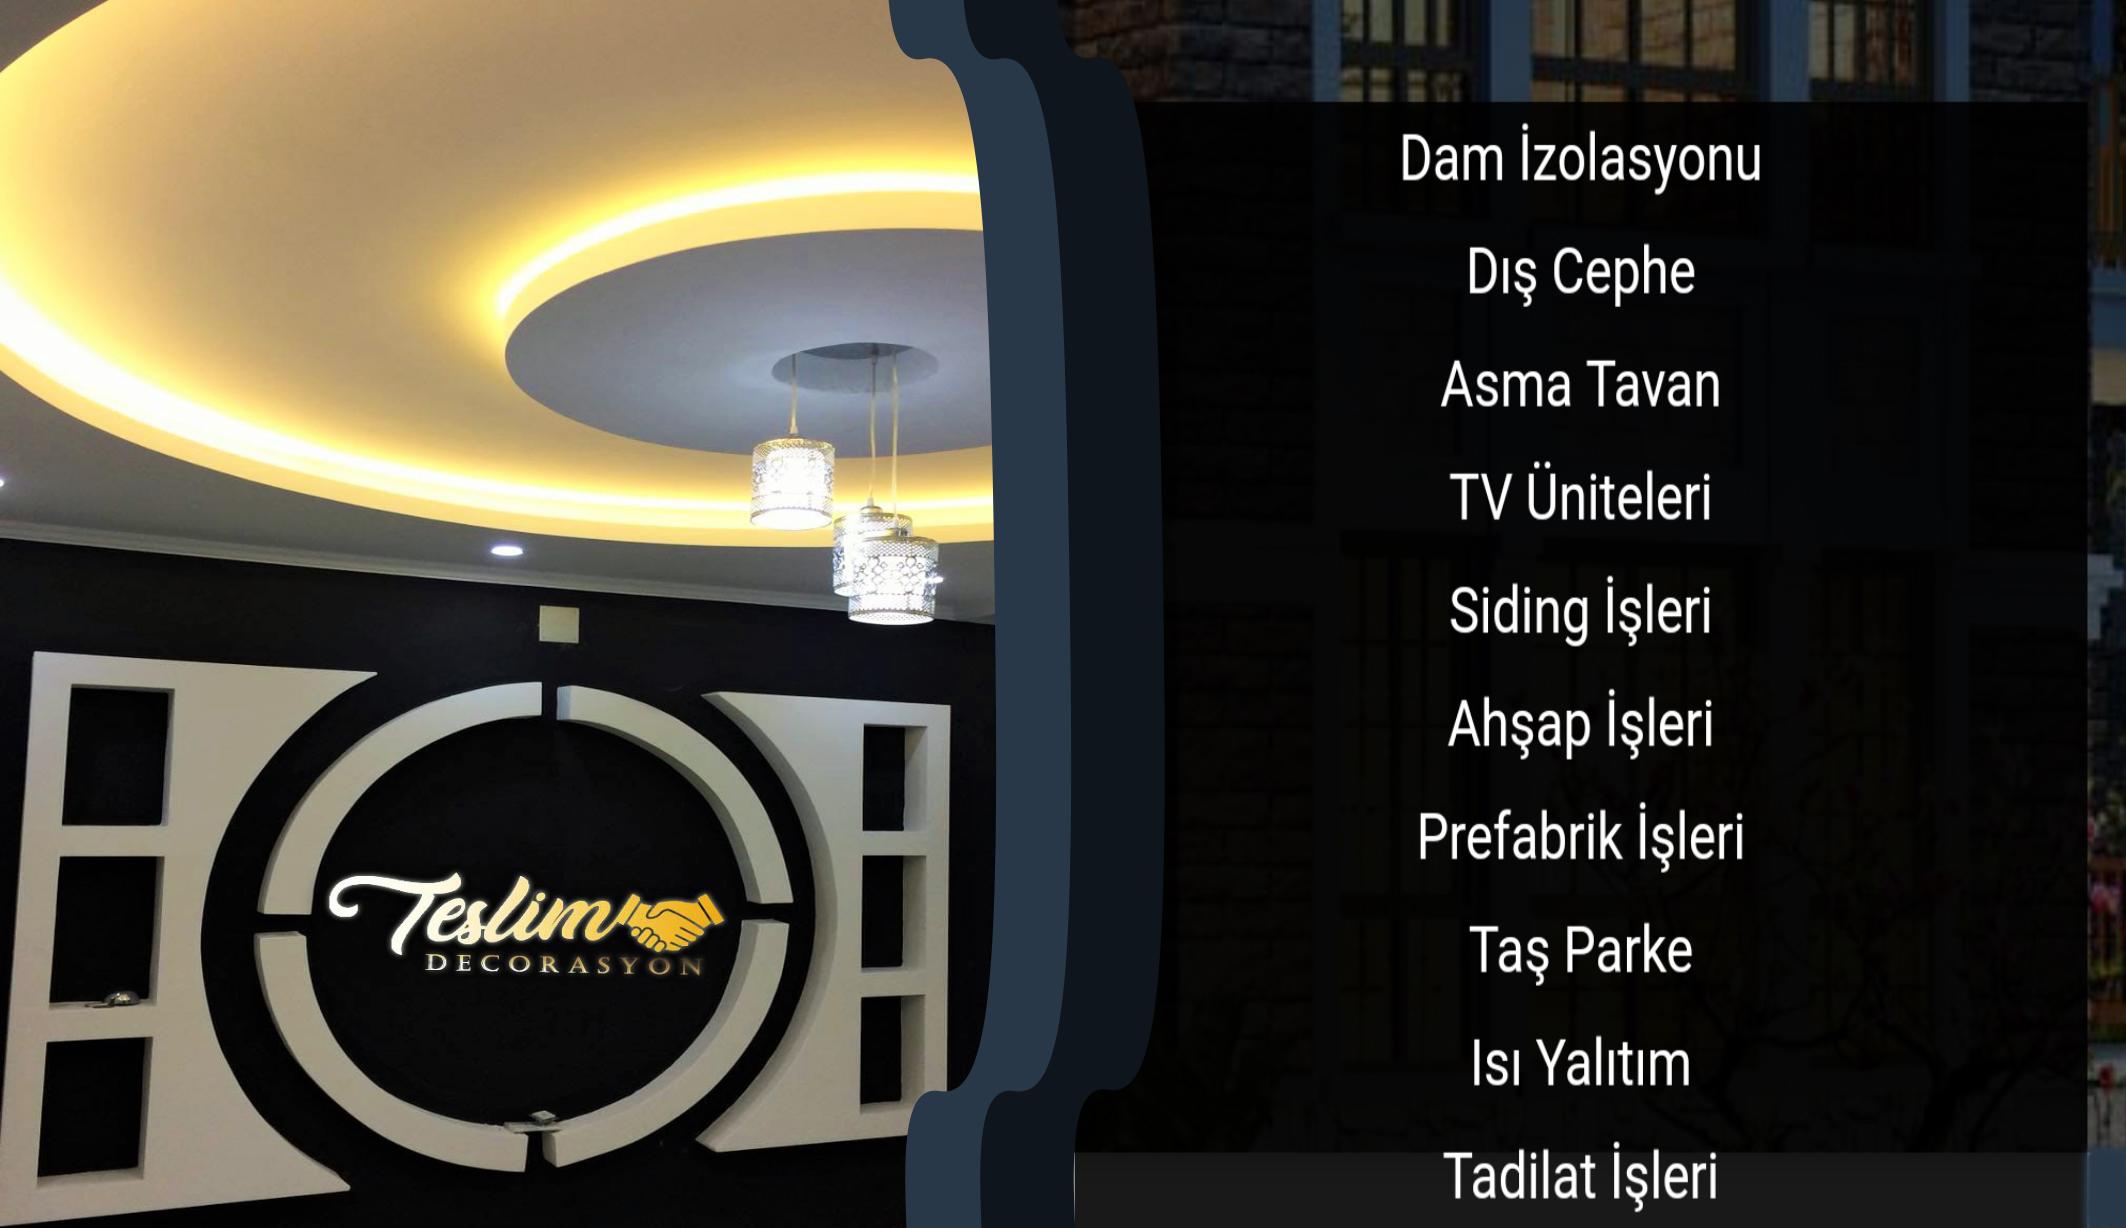 Teslim Dekorasyon Adana'da